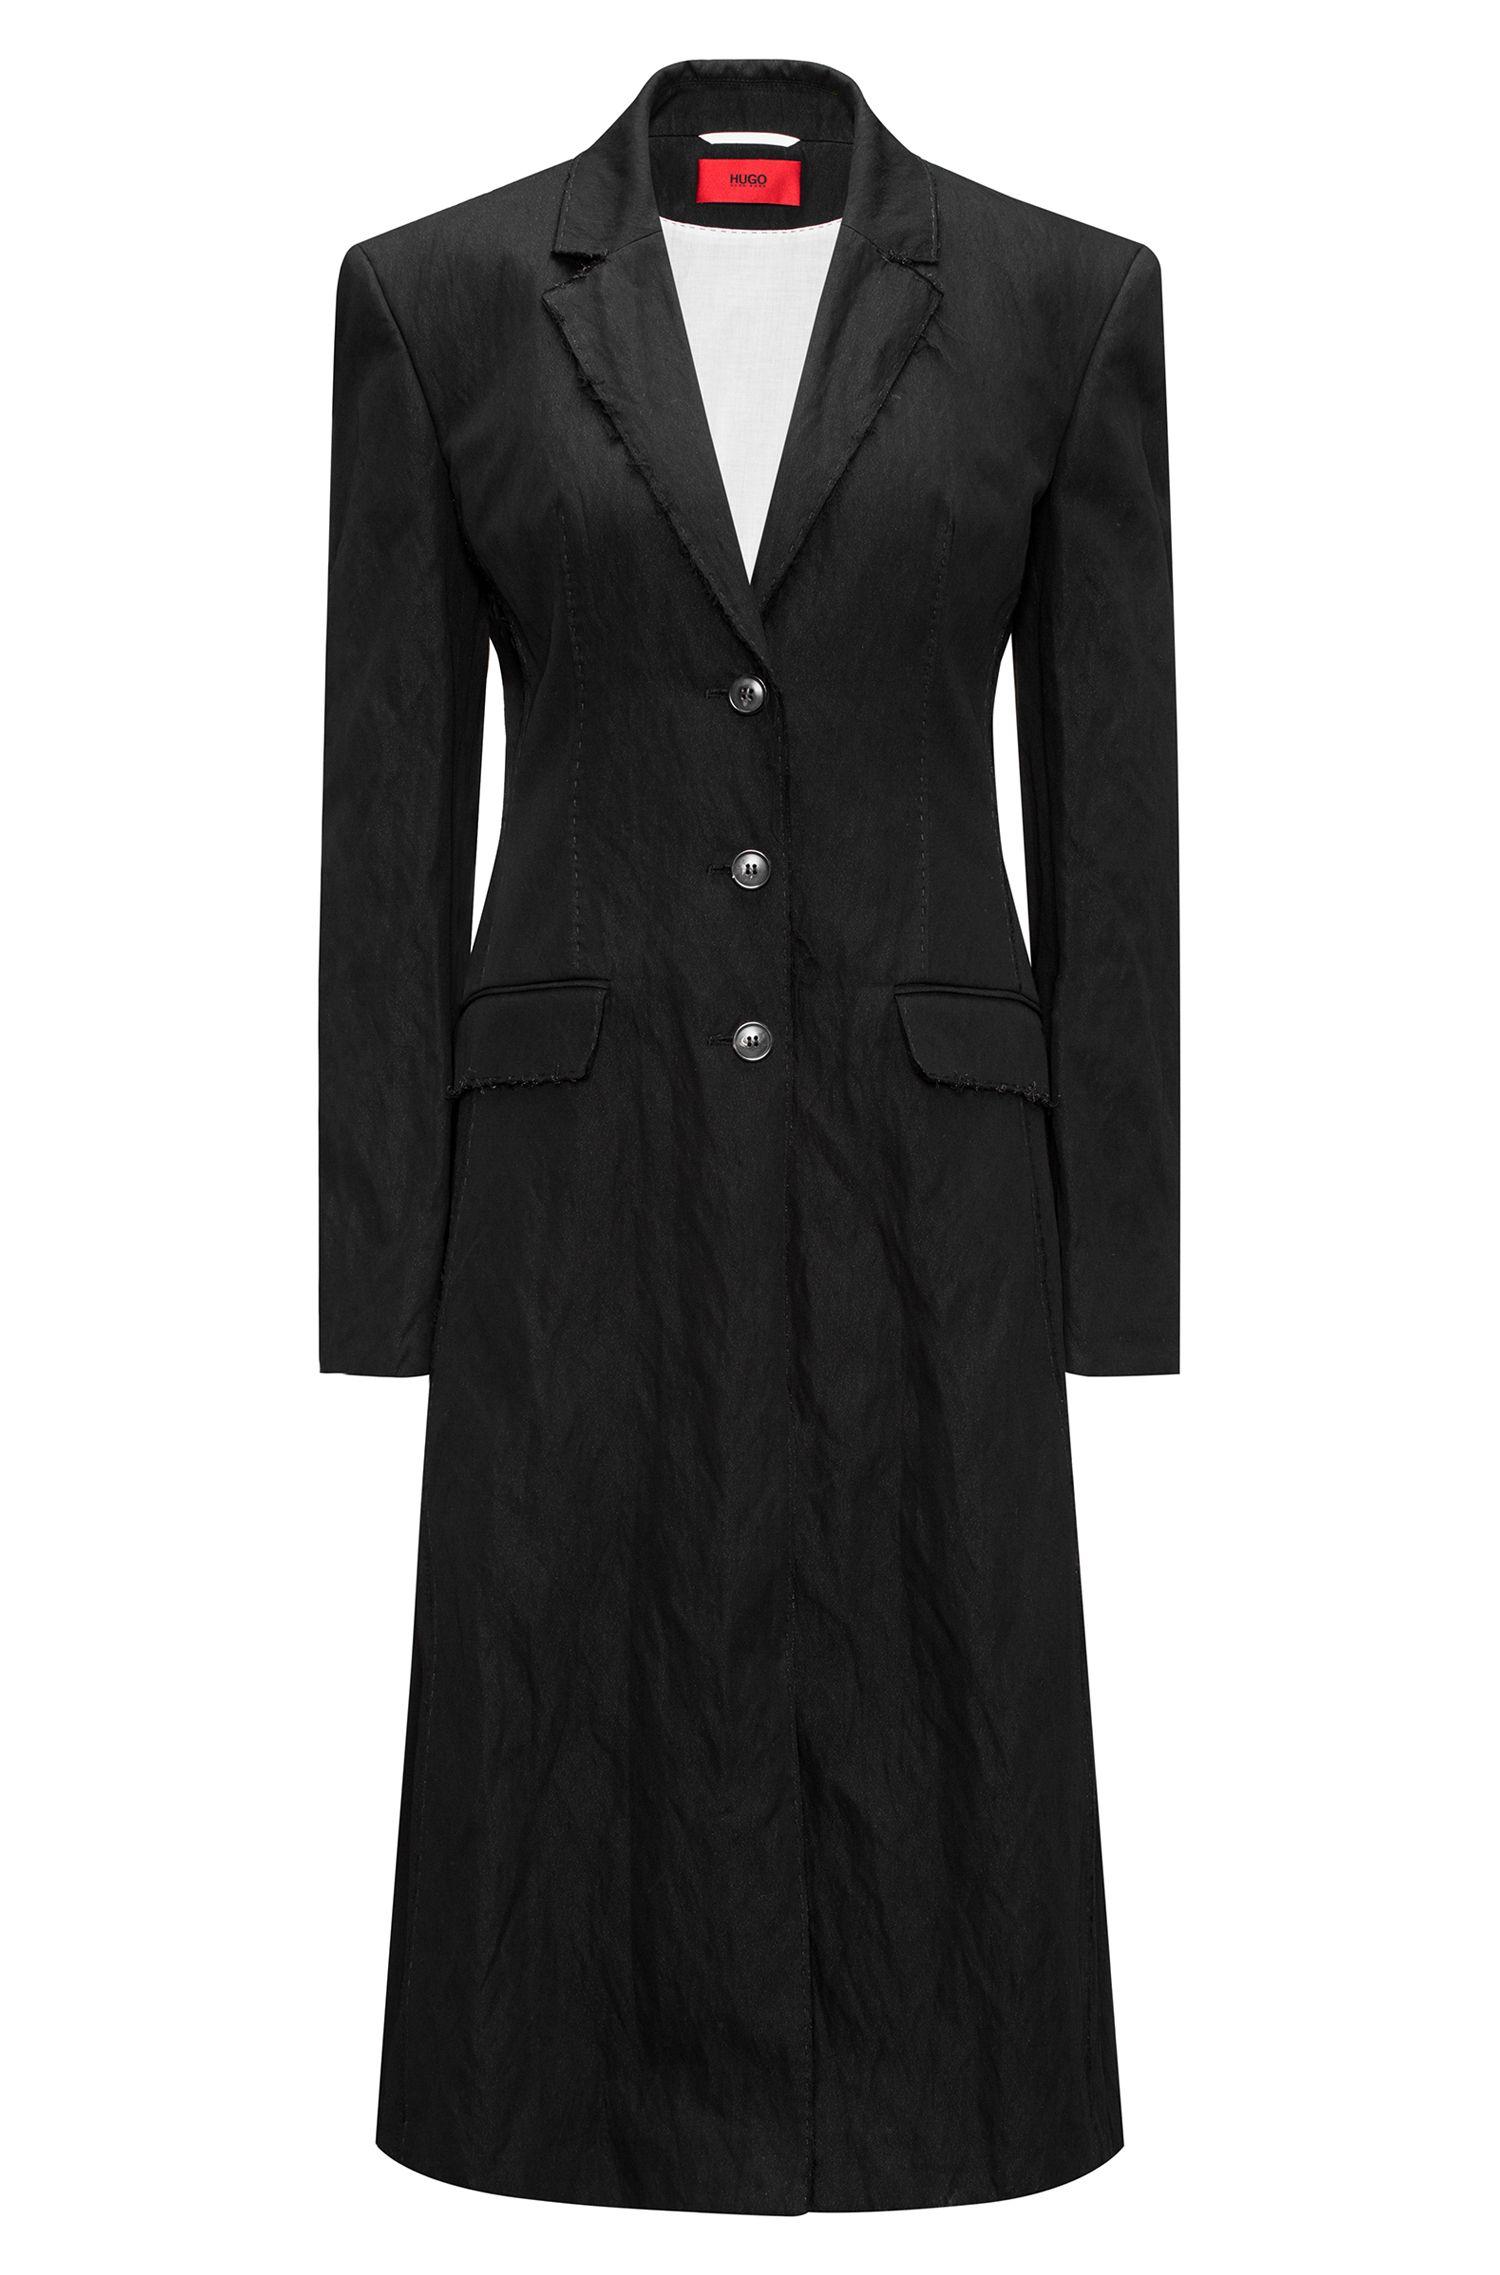 Langer Oversized Mantel aus Baumwoll-Mix mit offenen Kanten